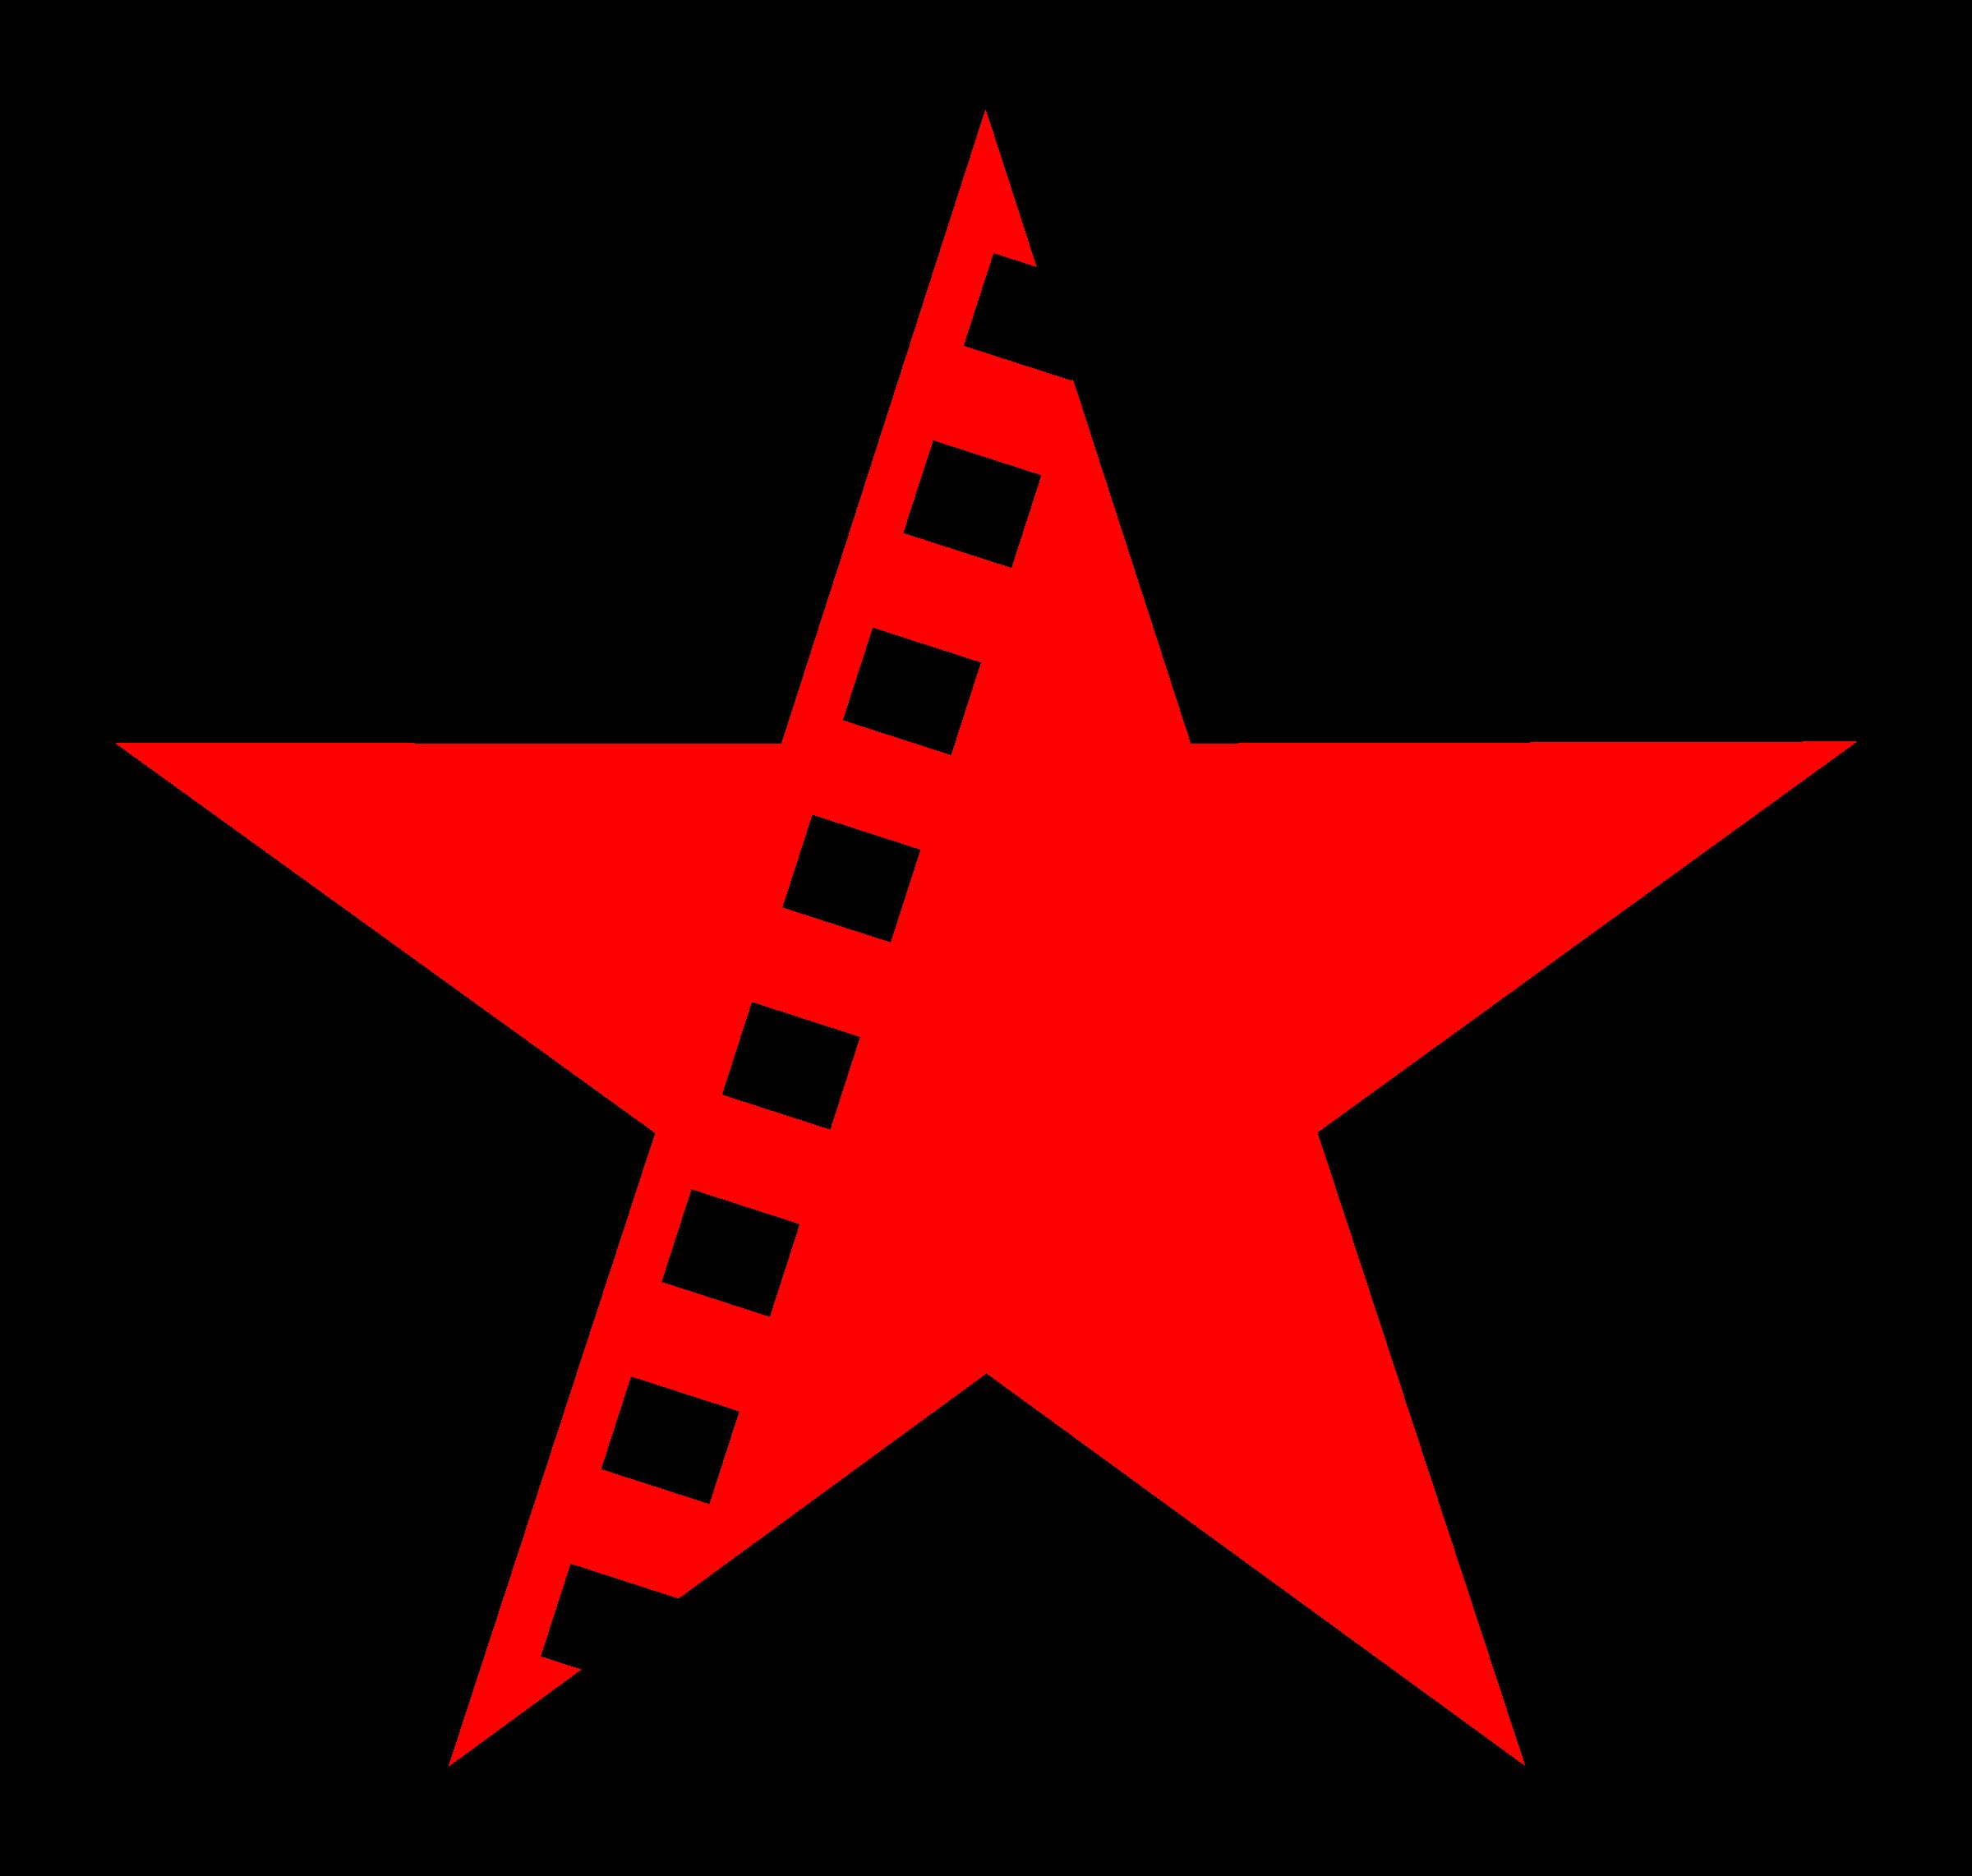 Fight clipart socialist. Revolutionary cinema big image